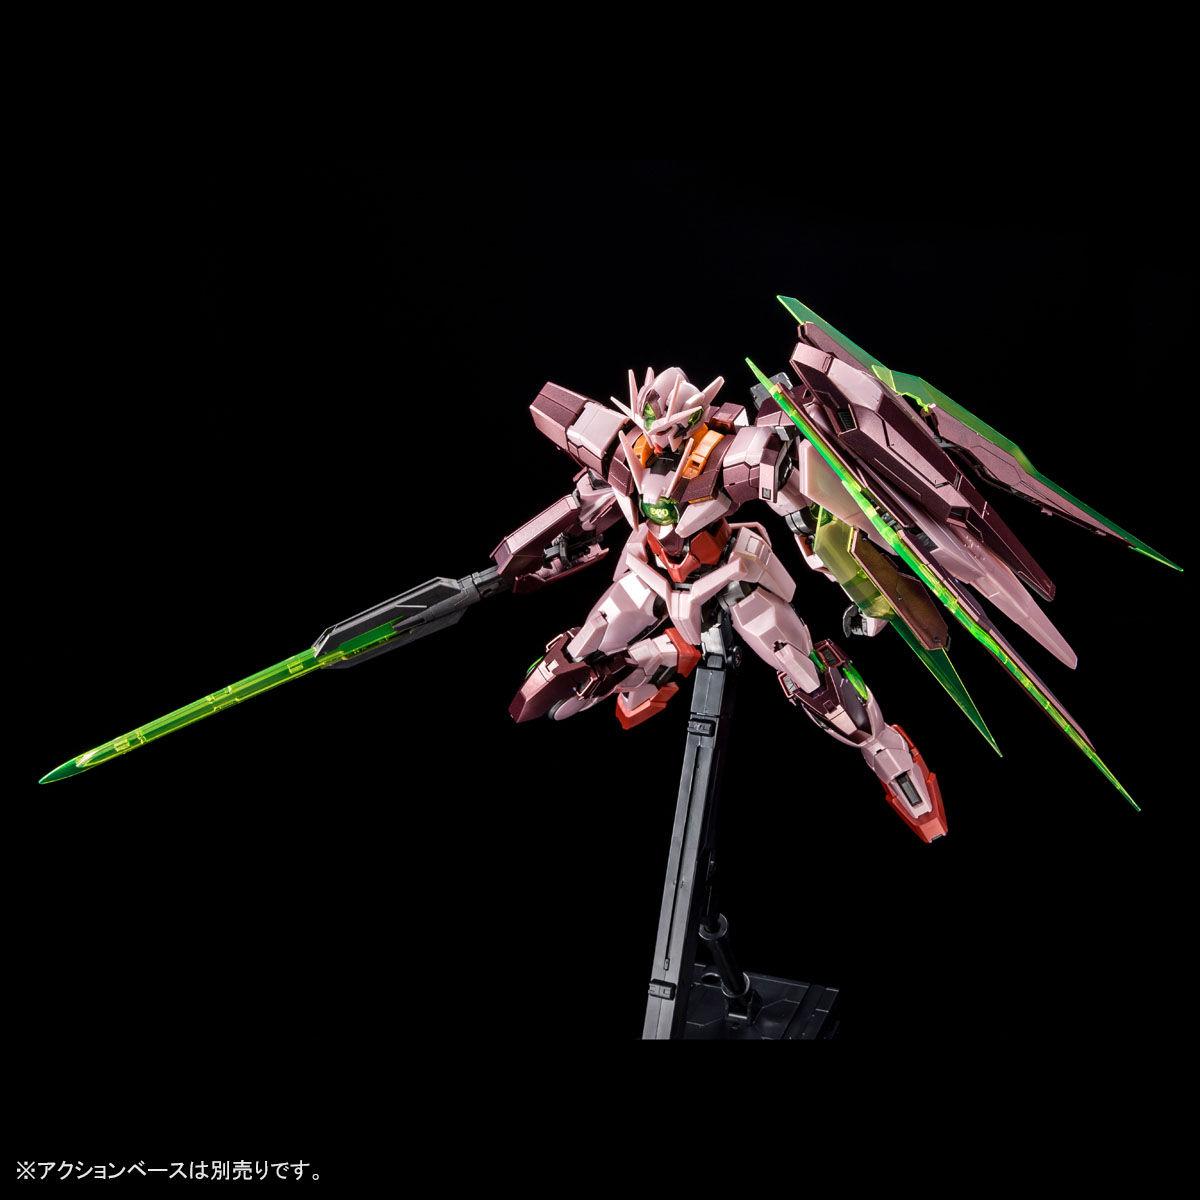 resale new release bandai gundam gunpla plastic model kit premium bandai p-bandai GNT-0000 Gundam 00 Qan[T] Trans-Am Mode Special Coating